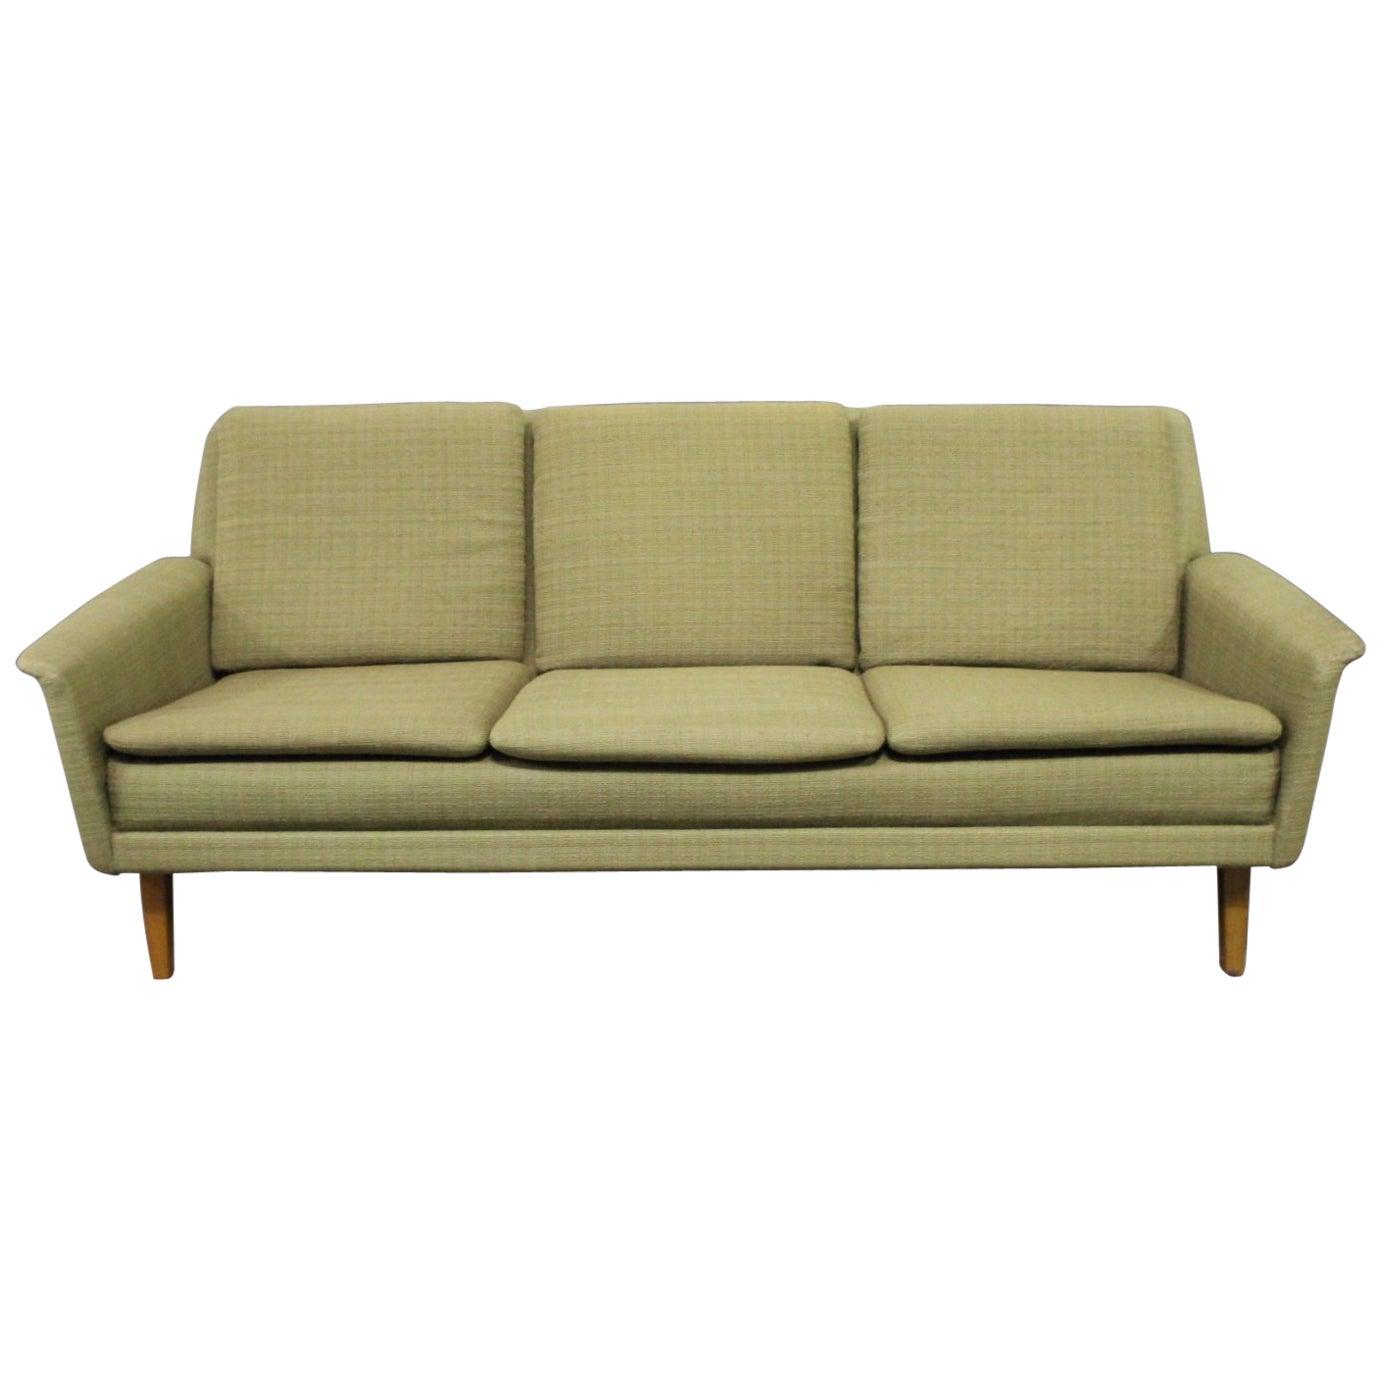 Three-Seat DUX Sofa by Folke Ohlsson and Fritz Hansen, 1960s